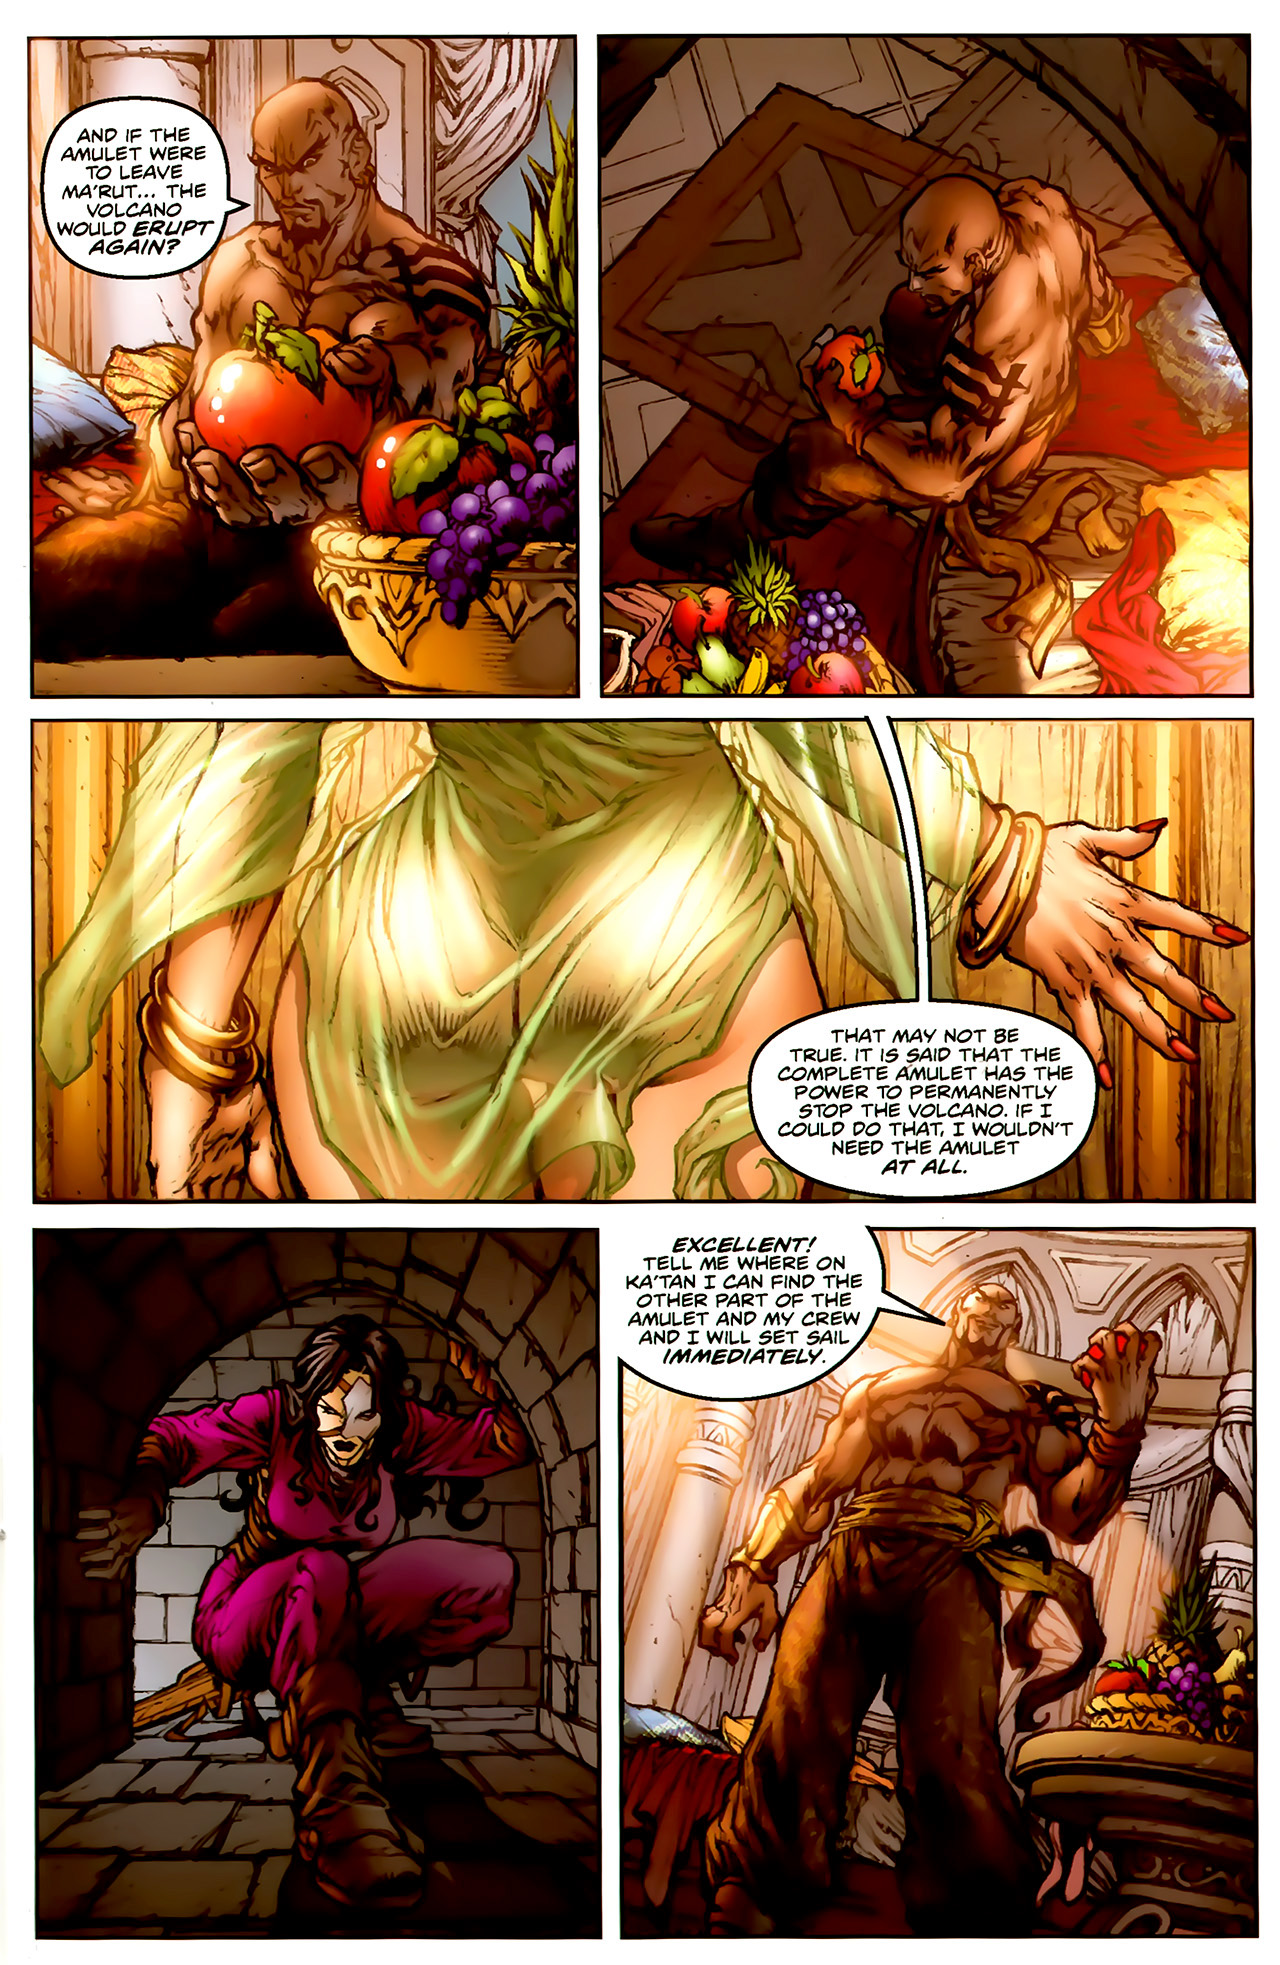 Read online 1001 Arabian Nights: The Adventures of Sinbad comic -  Issue #1 - 26